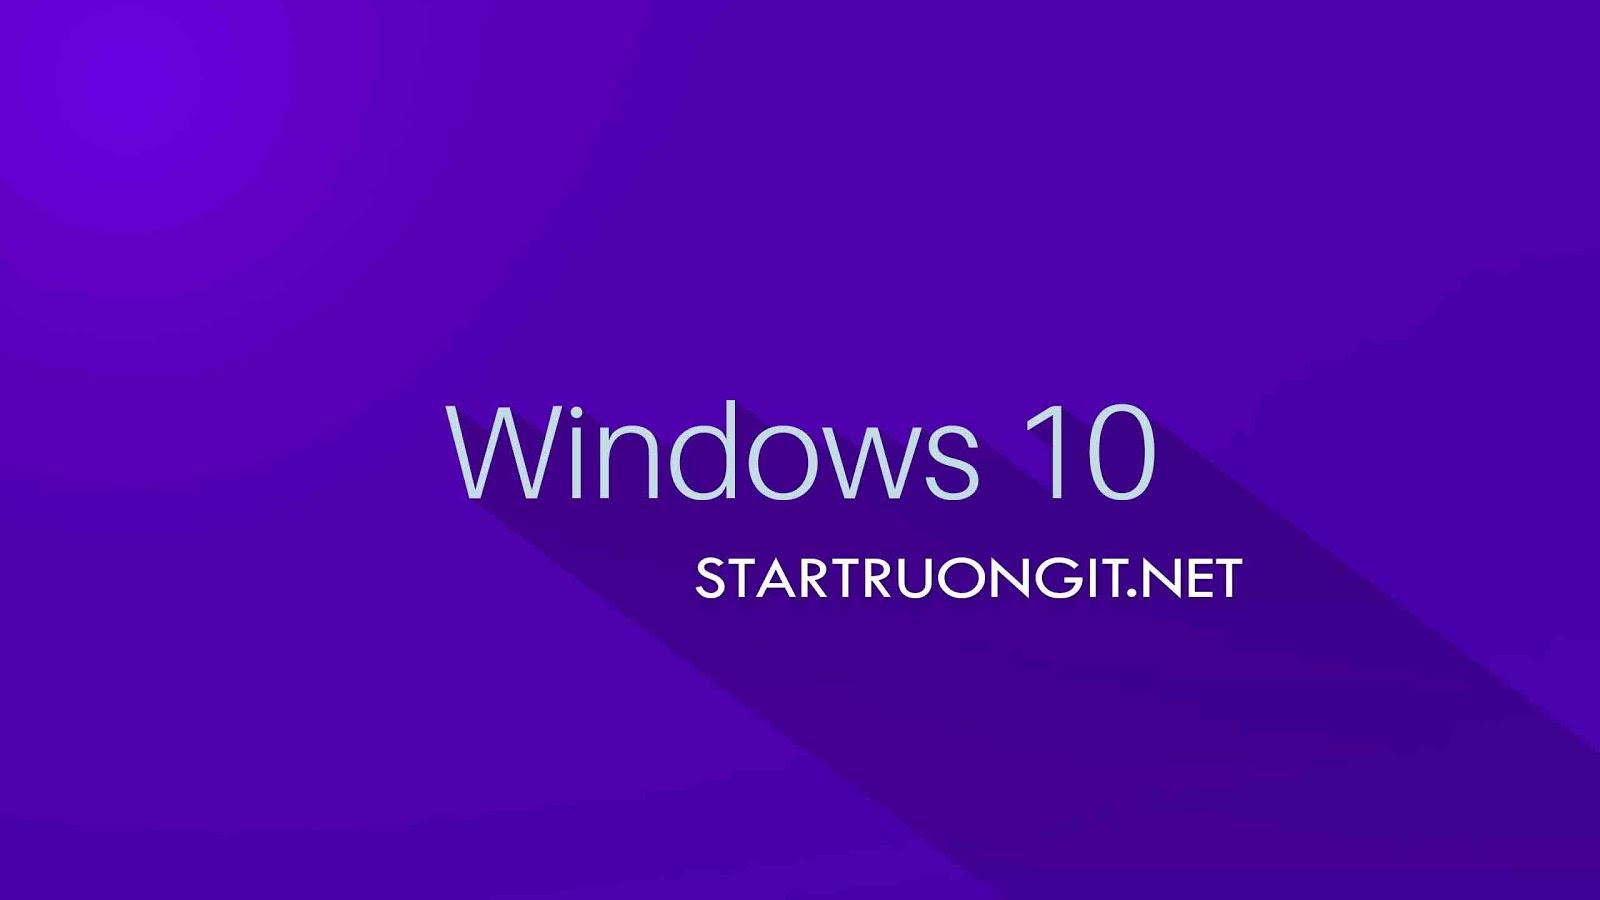 Cách sửa lỗi 0xc0000225 trên Windows 7/8/8.1/10